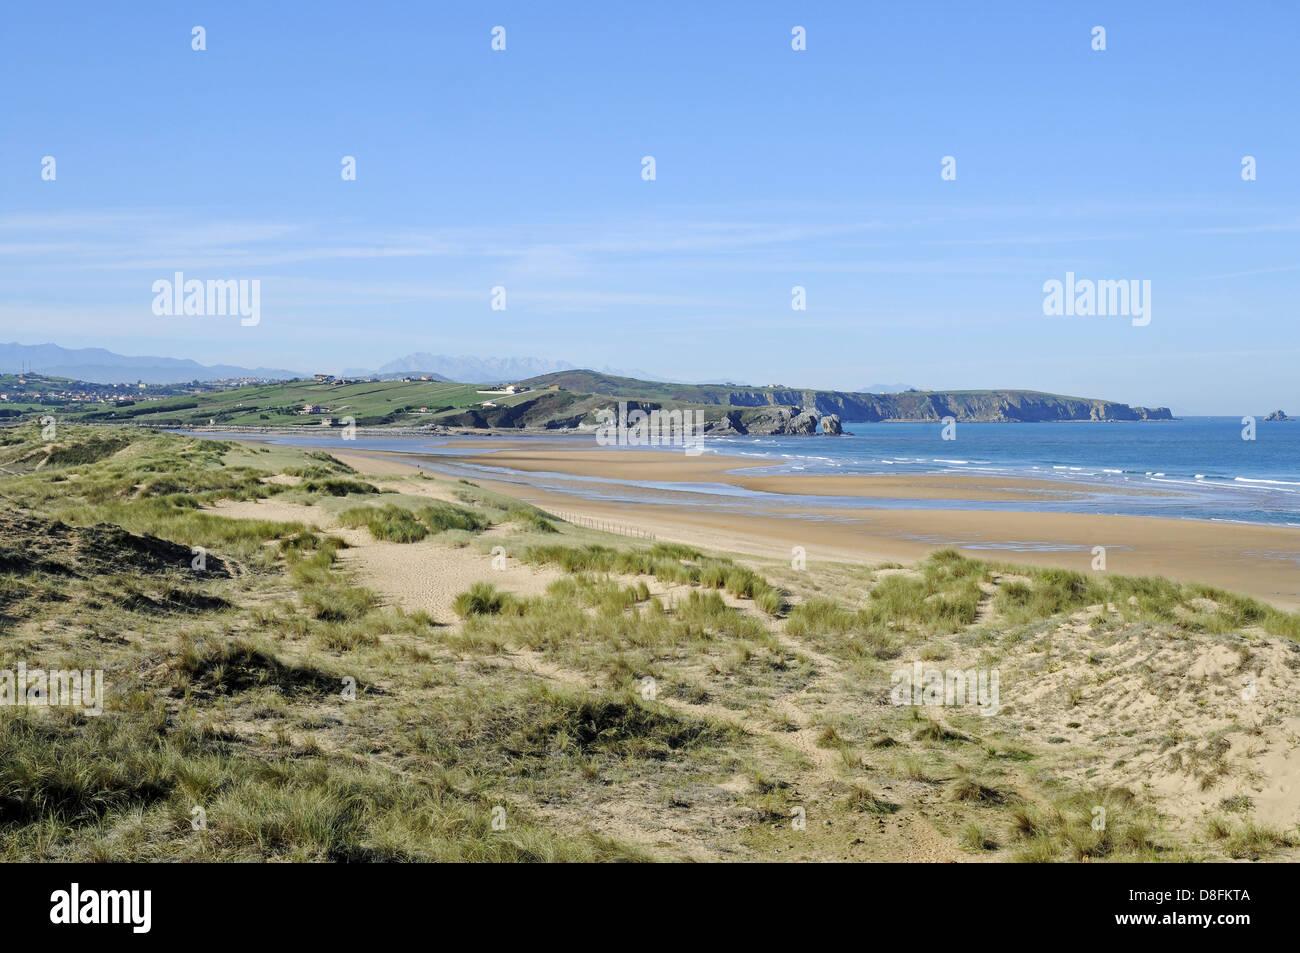 Playa de Valdearenas - Stock Image